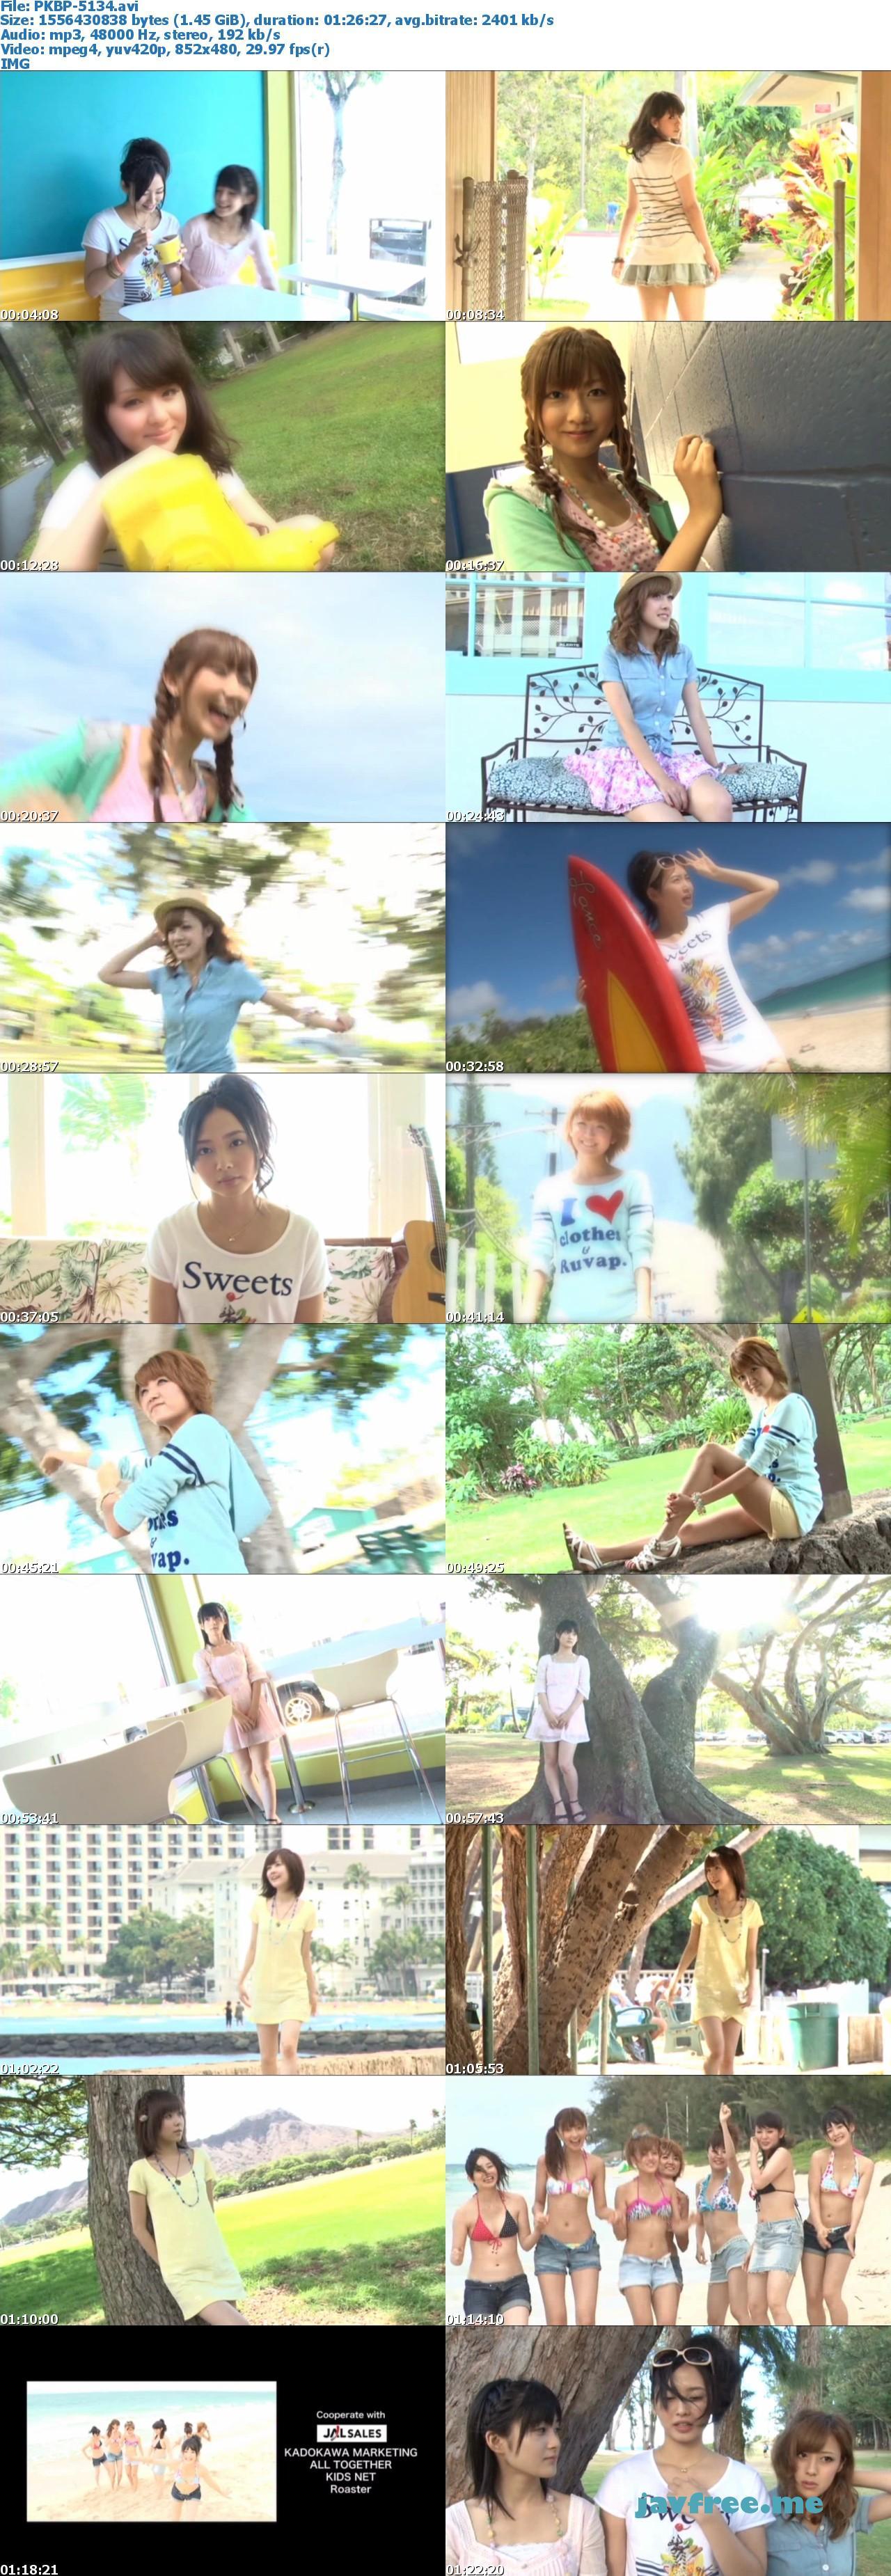 [PKBP-5134] アロハロ!Berryz工房DVD/Berryz工房 - image PKBP-5134_s on https://javfree.me